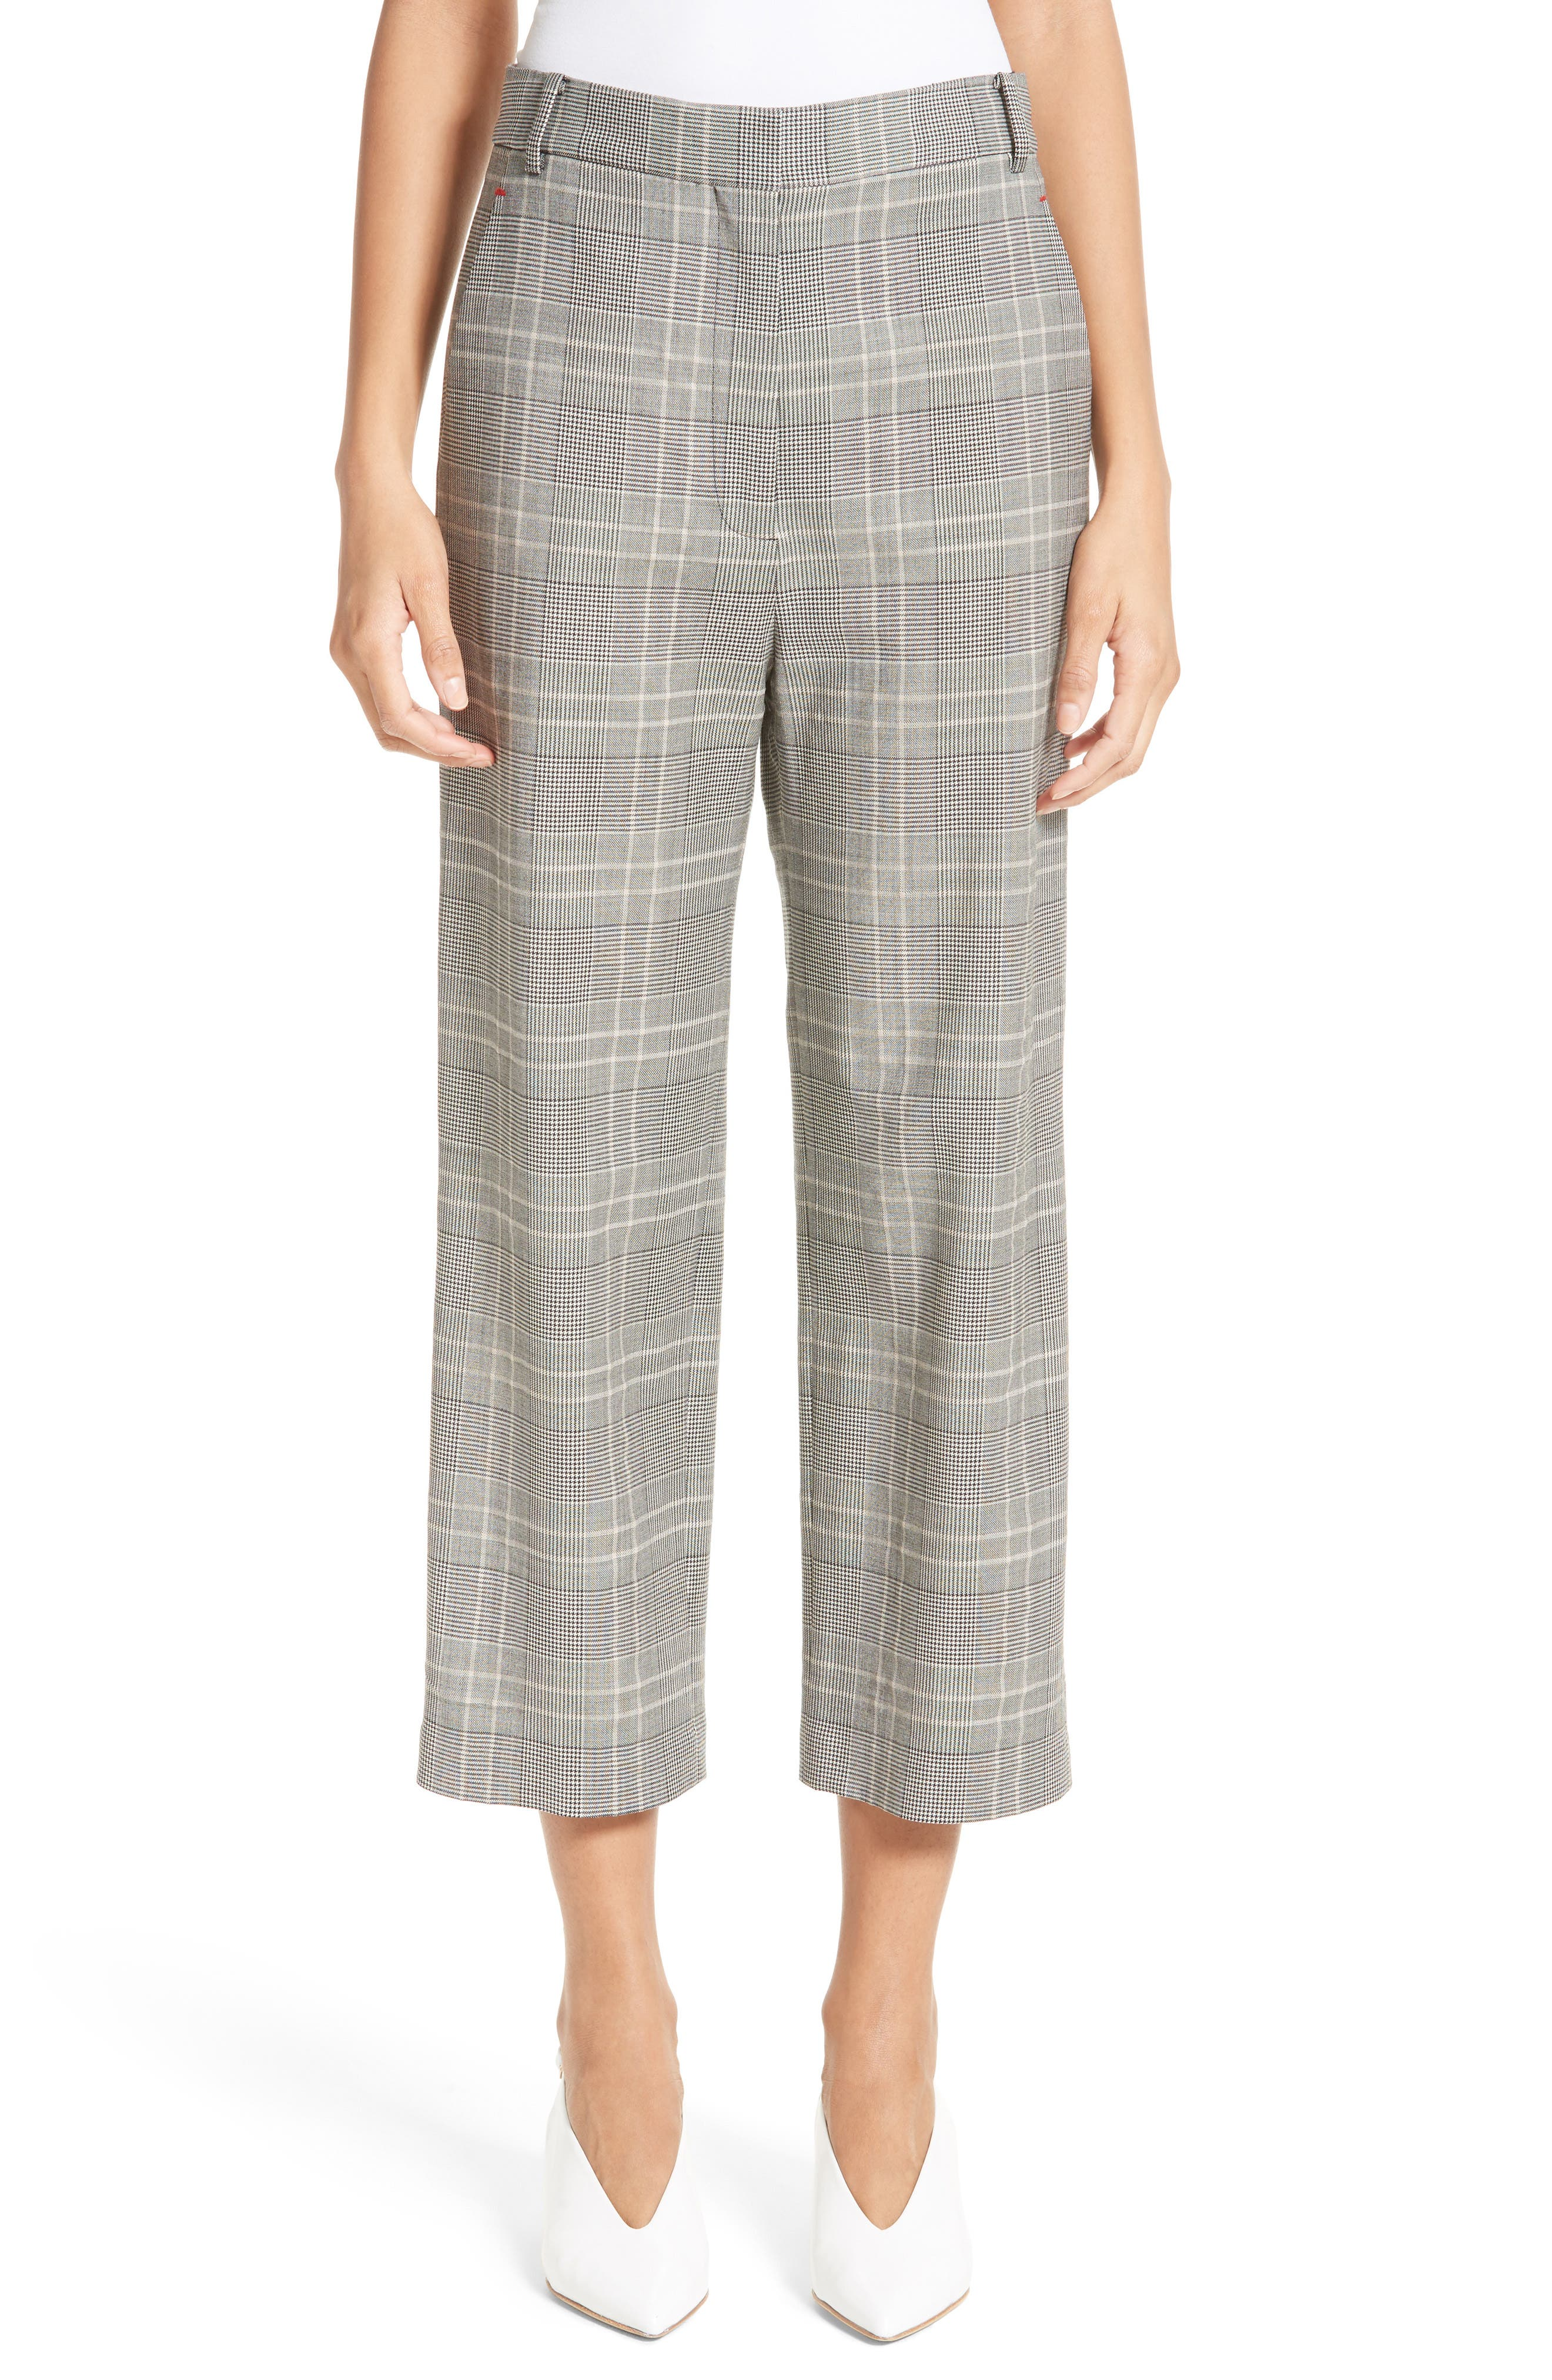 Plaid High Rise Crop Pants,                         Main,                         color, Handloom - Grey Multi